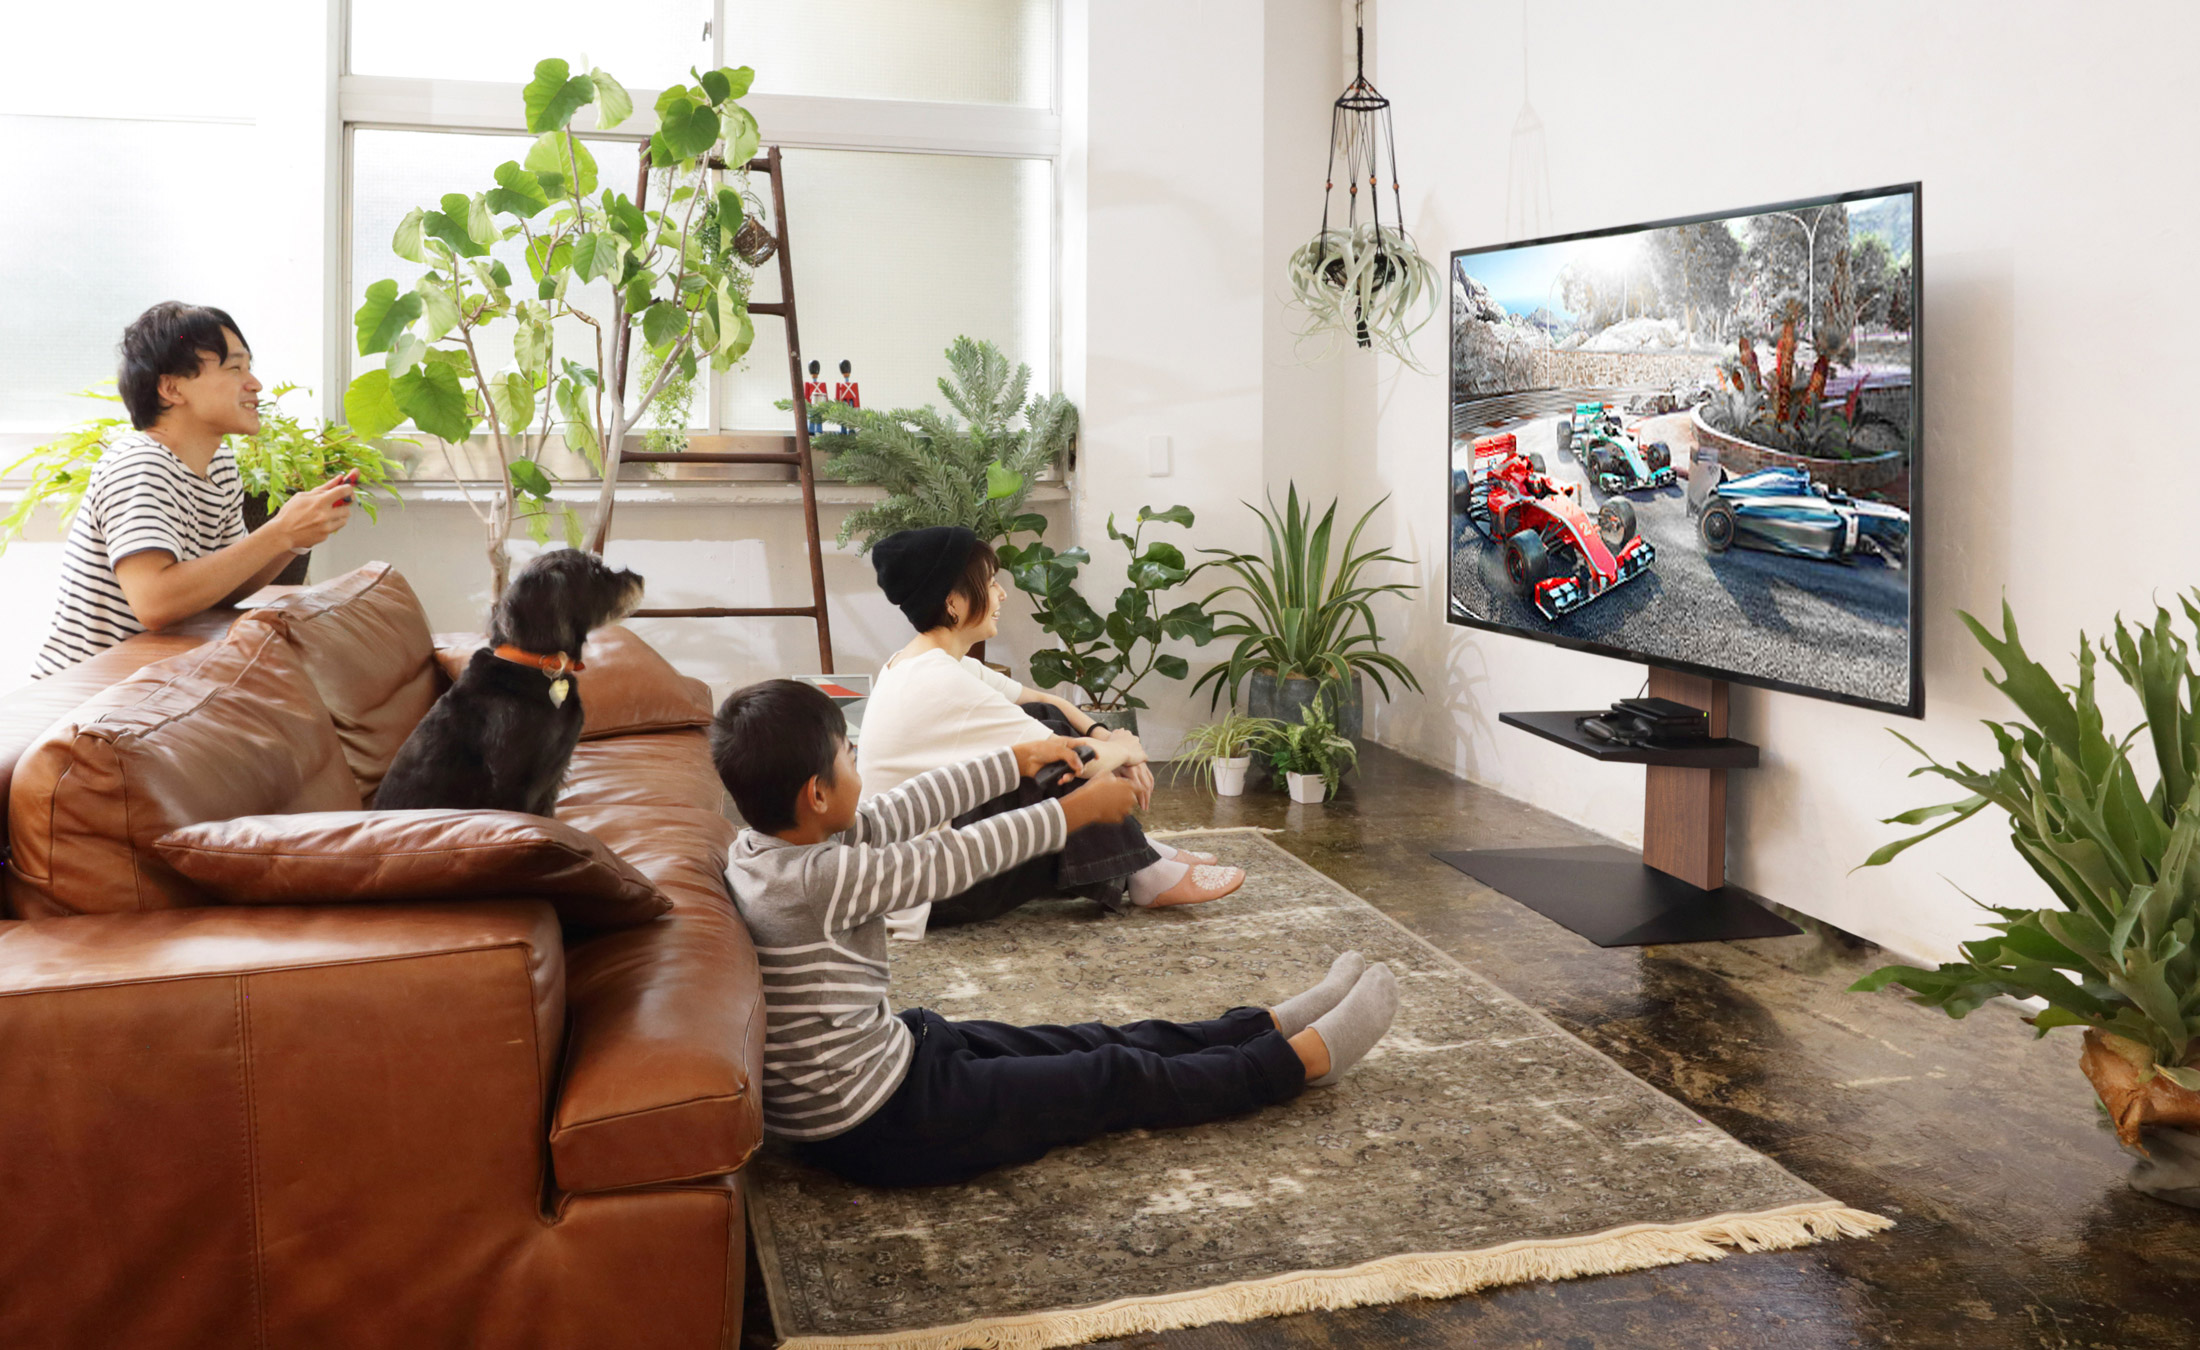 WALL INTERIOR TV STAND V3 壁寄せテレビスタンドV3 LIVING ROOM 5枚目